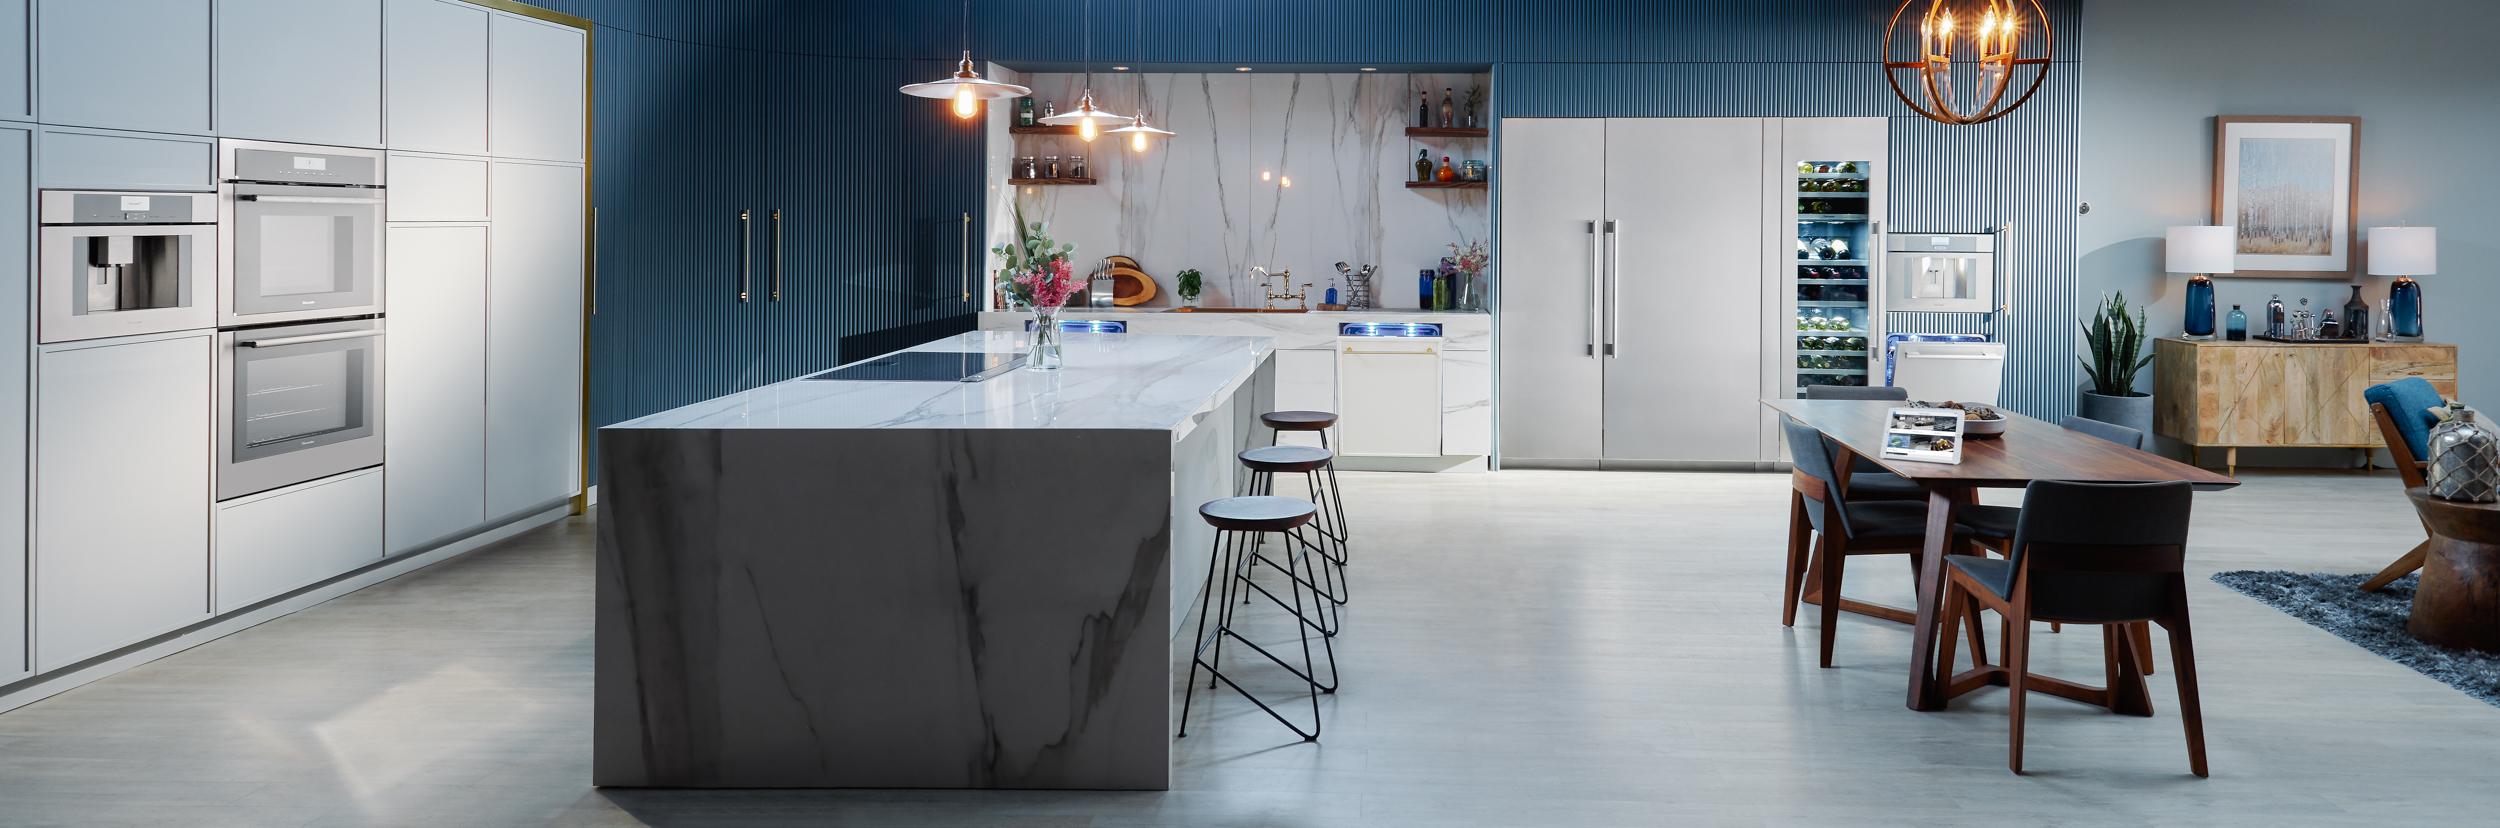 Thermador-master-36-inch-Fridge-T36IR900SP-blue-kitchen-vignette-2-master.jpg